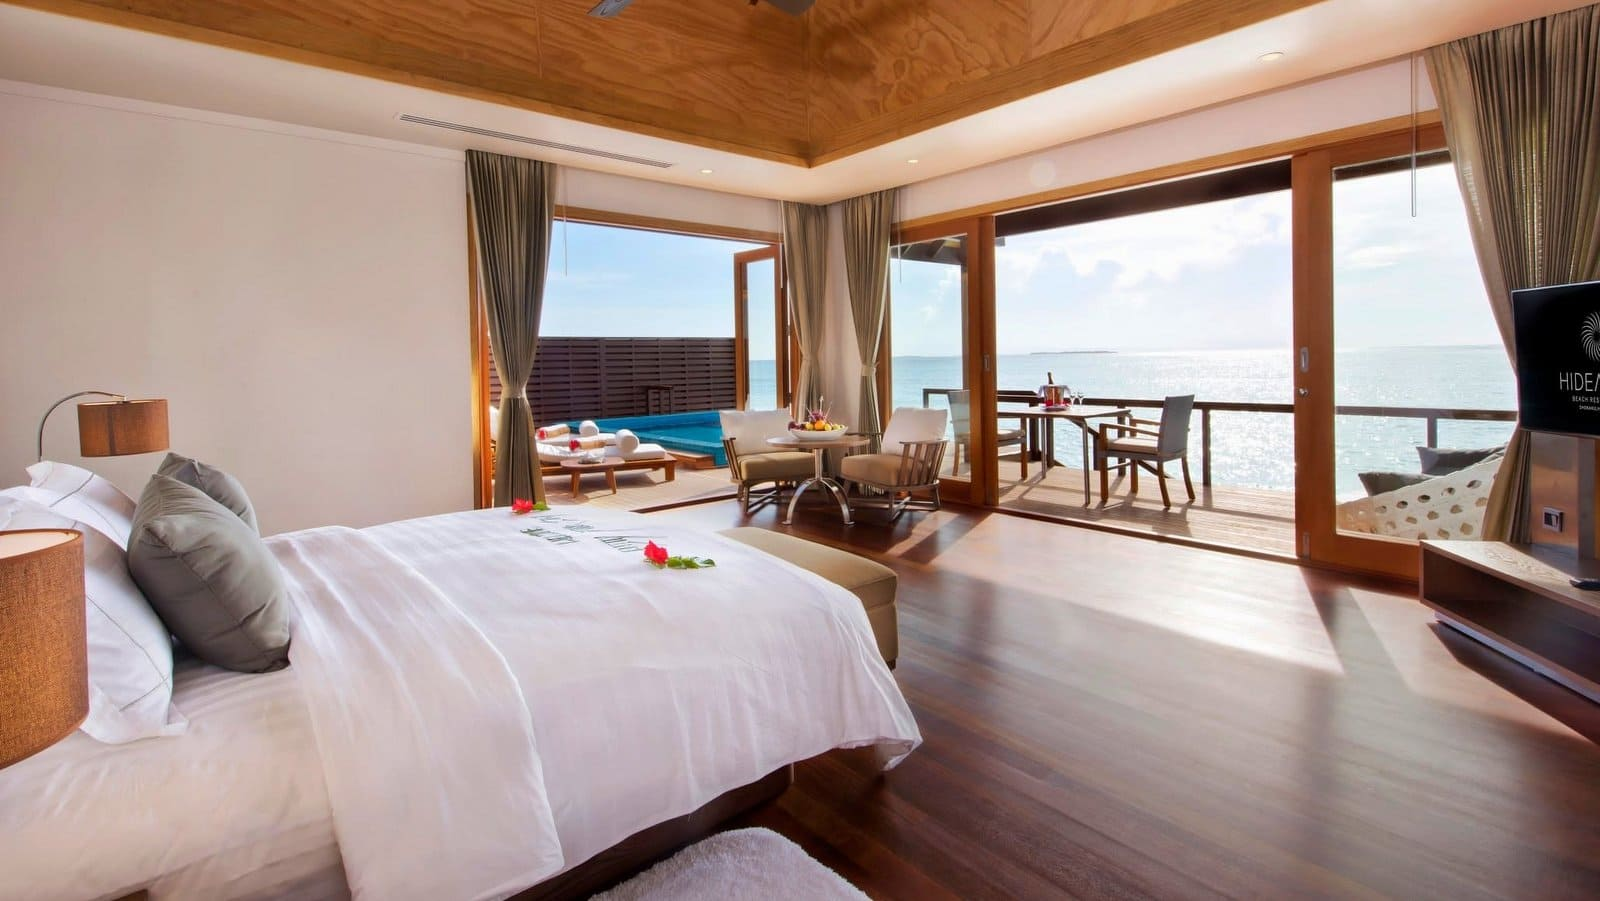 Мальдивы, Отель Hideaway Beach Resort & Spa, номер Ocean Villa 2-Bedroom with Pool